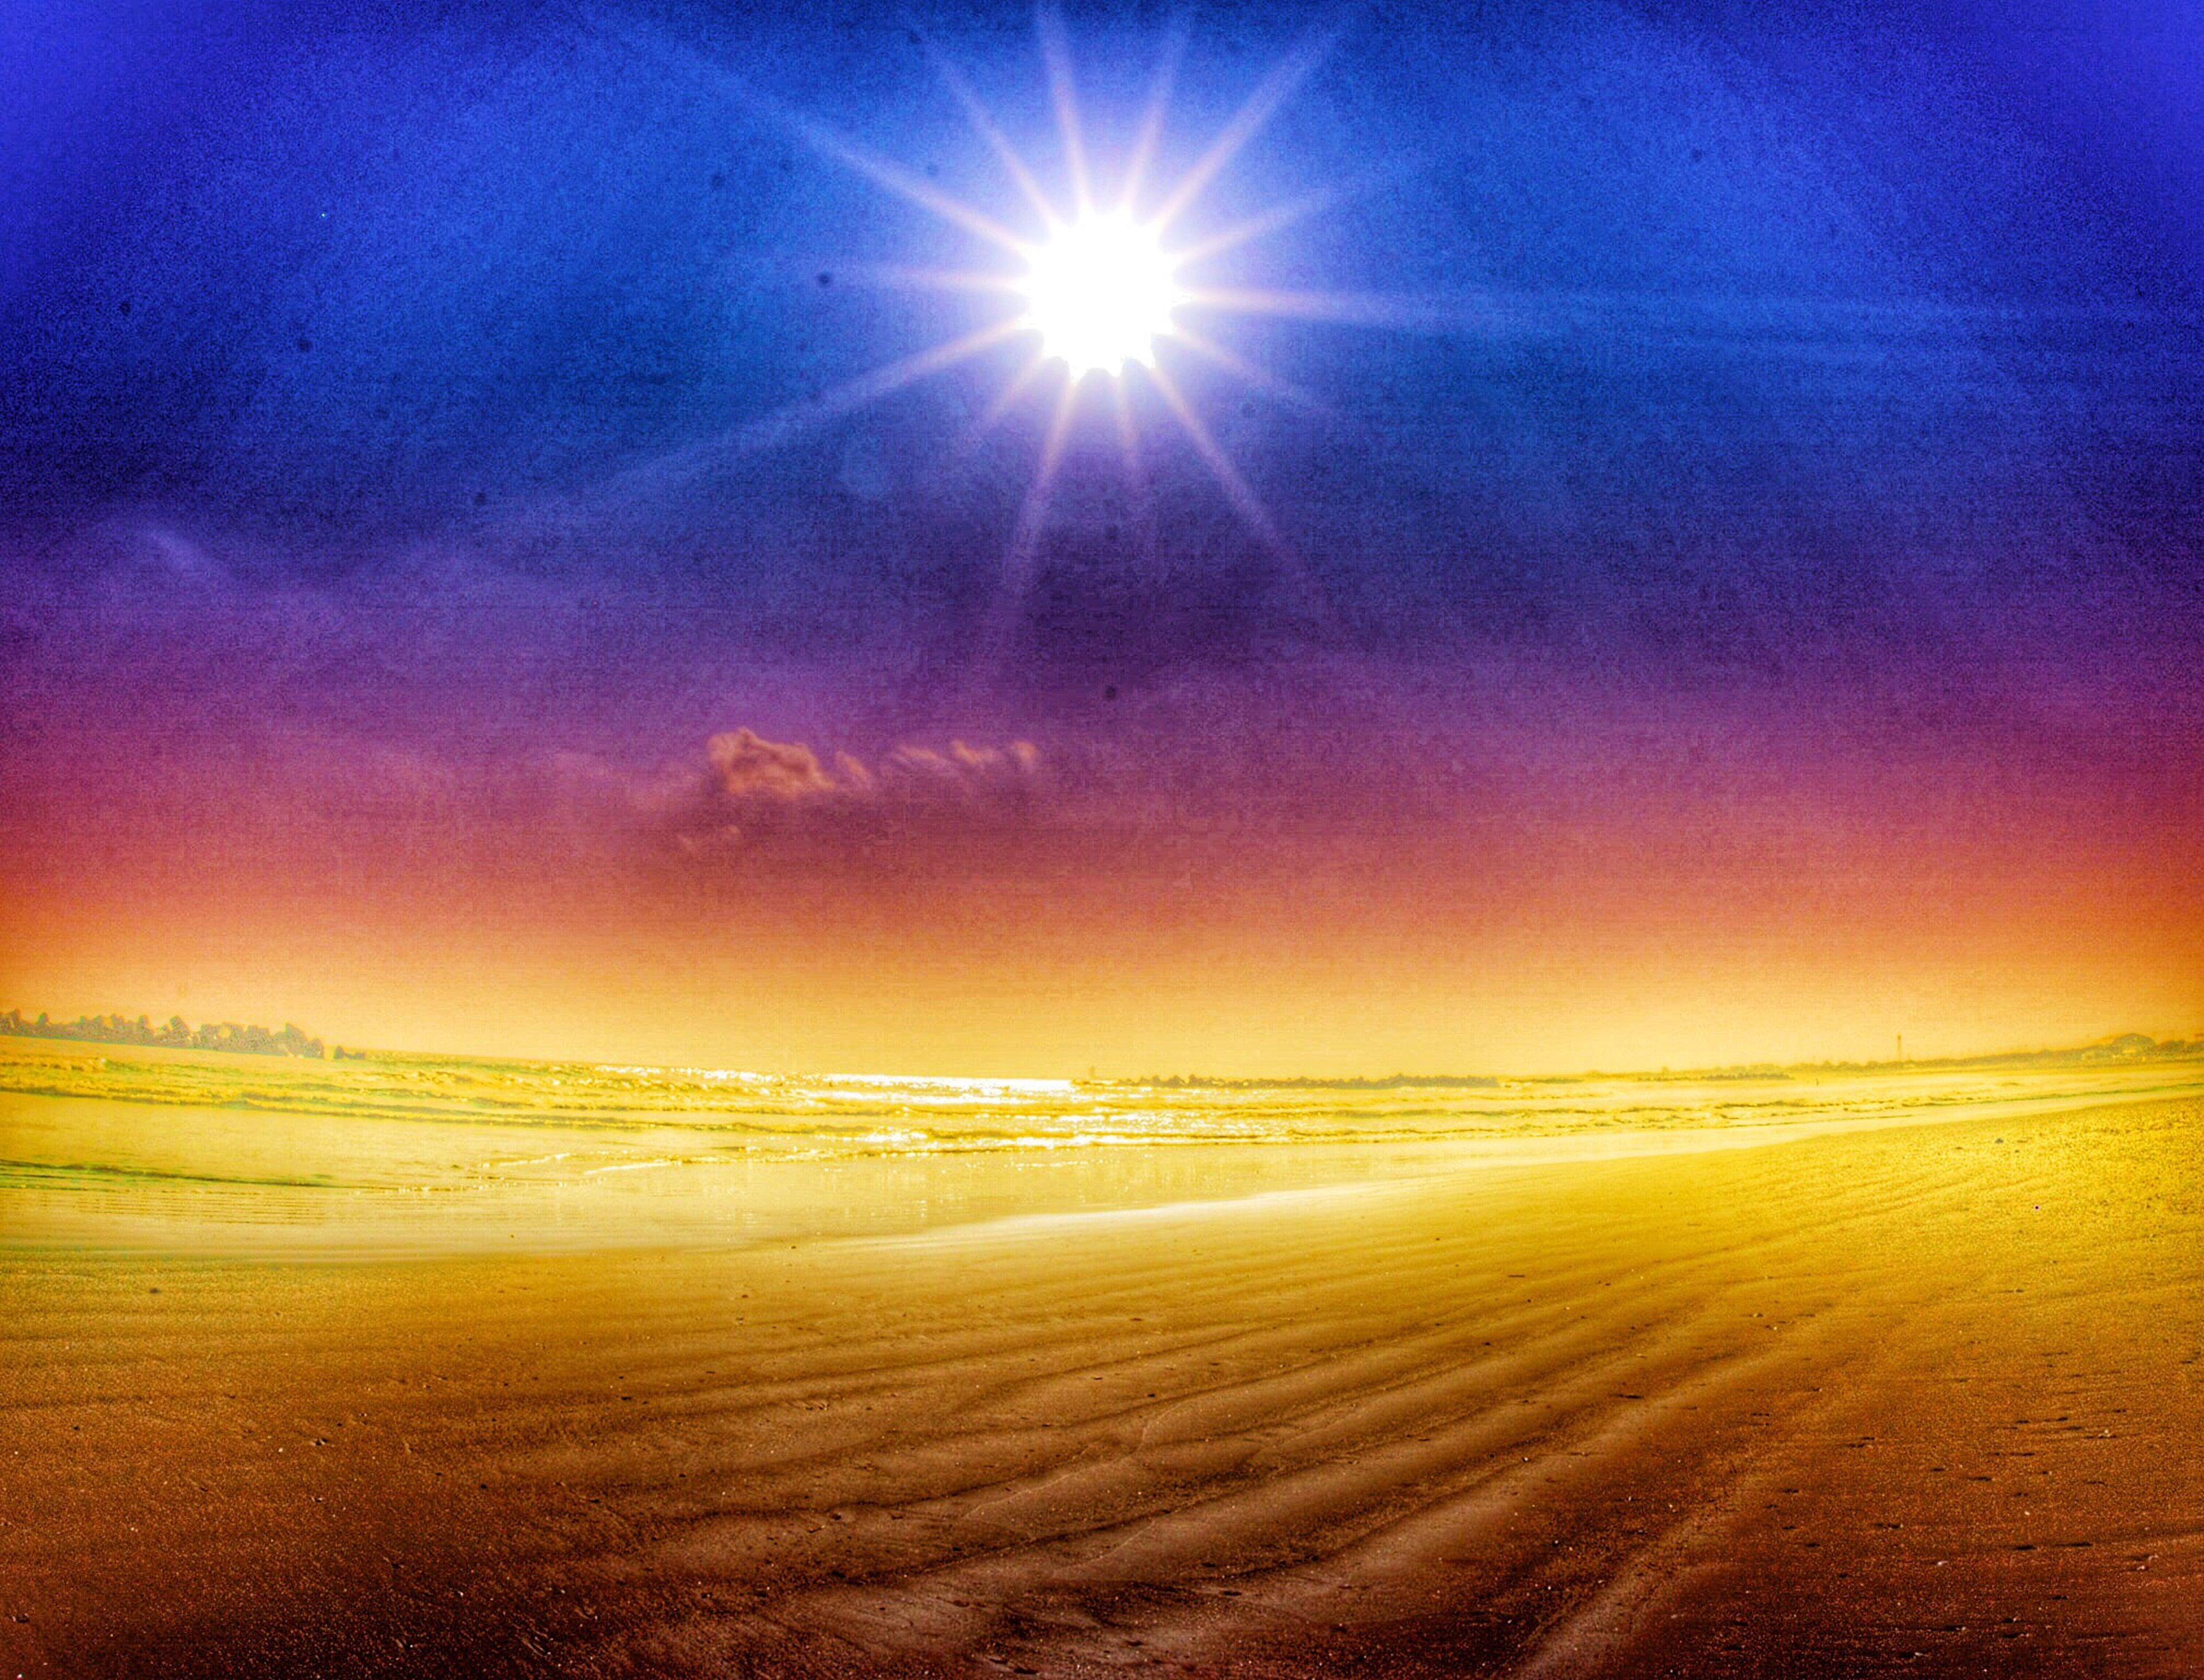 sun, tranquility, sky, tranquil scene, scenics, sunbeam, beauty in nature, sunlight, sunset, nature, cloud - sky, lens flare, idyllic, landscape, cloud, non-urban scene, bright, outdoors, no people, beach